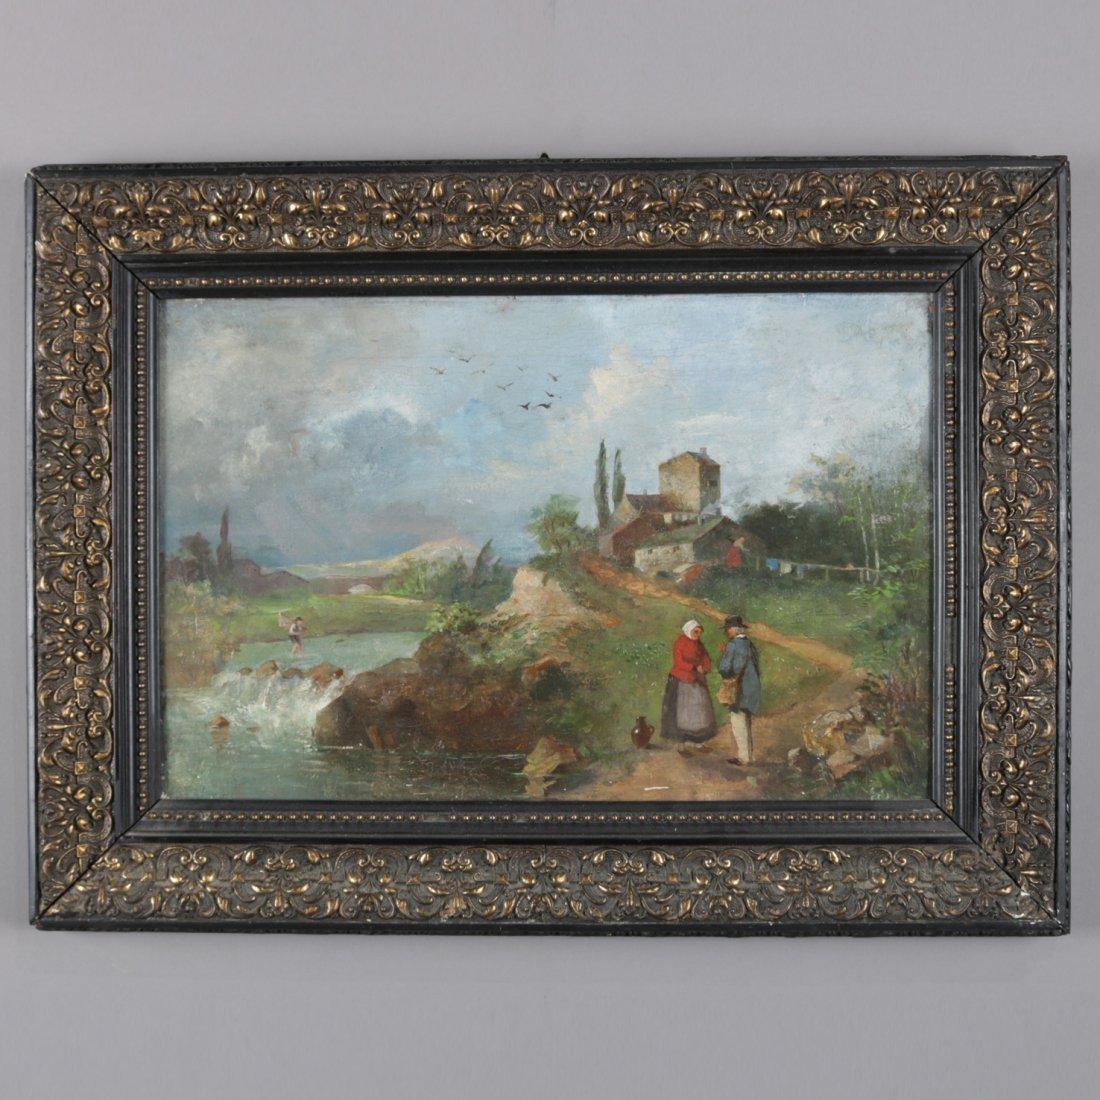 Antique Oil on Canvas Landscape Painting with Farm